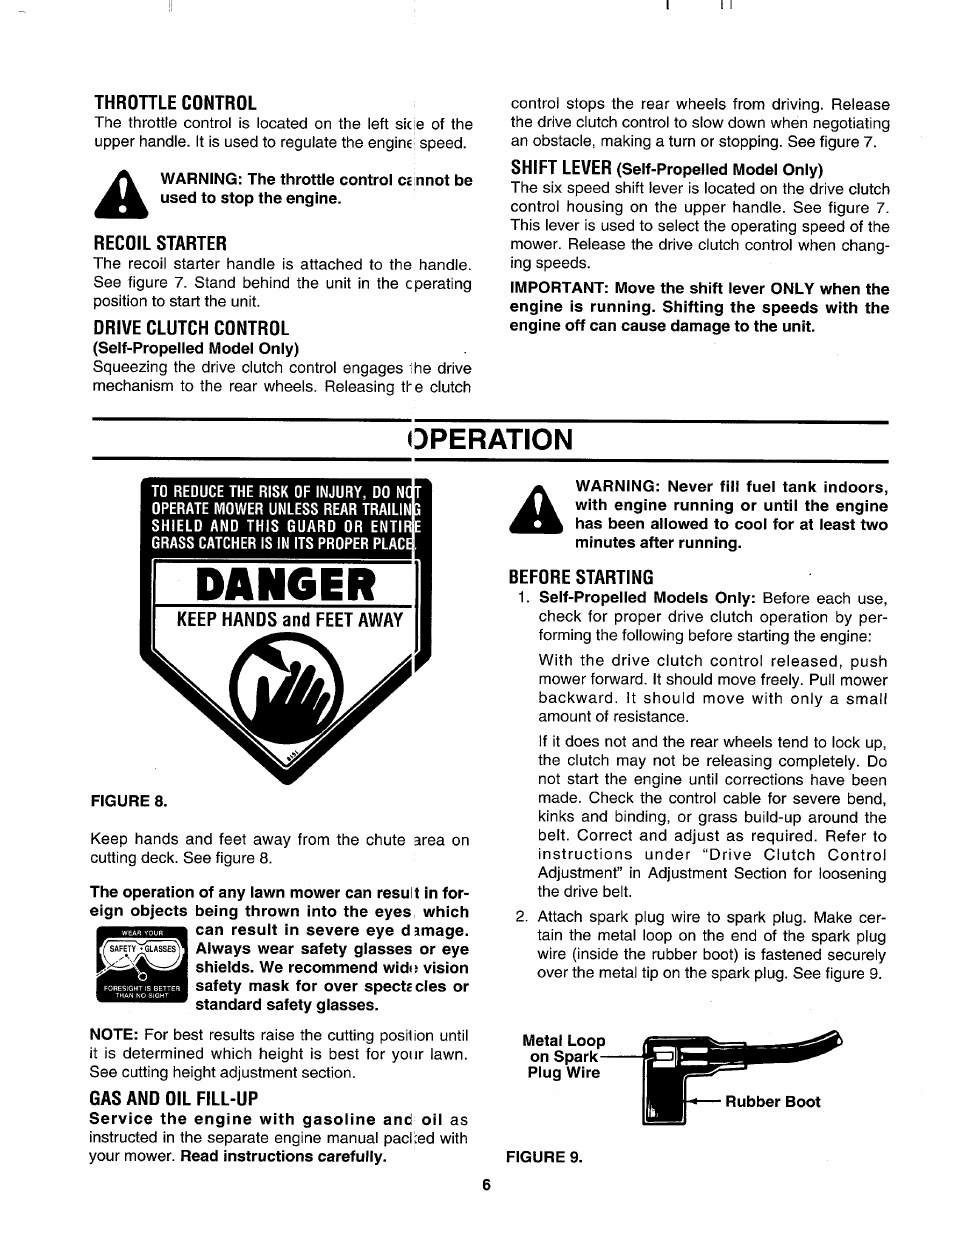 throttle control recoil starter drive clutch control bolens 124 rh manualsdir com bolens bl110 user manual Instruction Manual